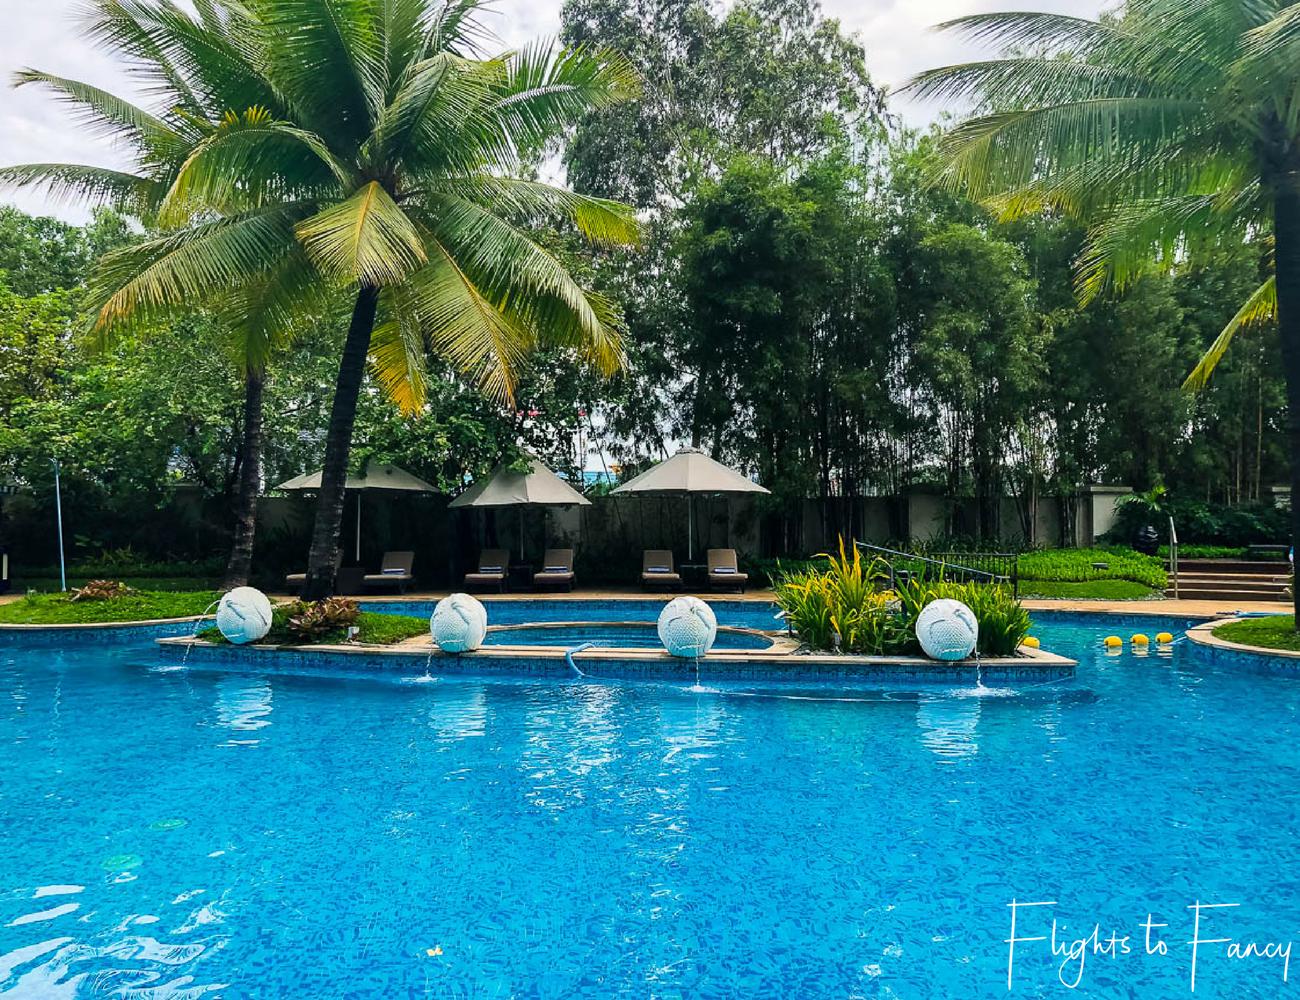 Flights To Fancy @ Radisson Blu Cebu City. Pool